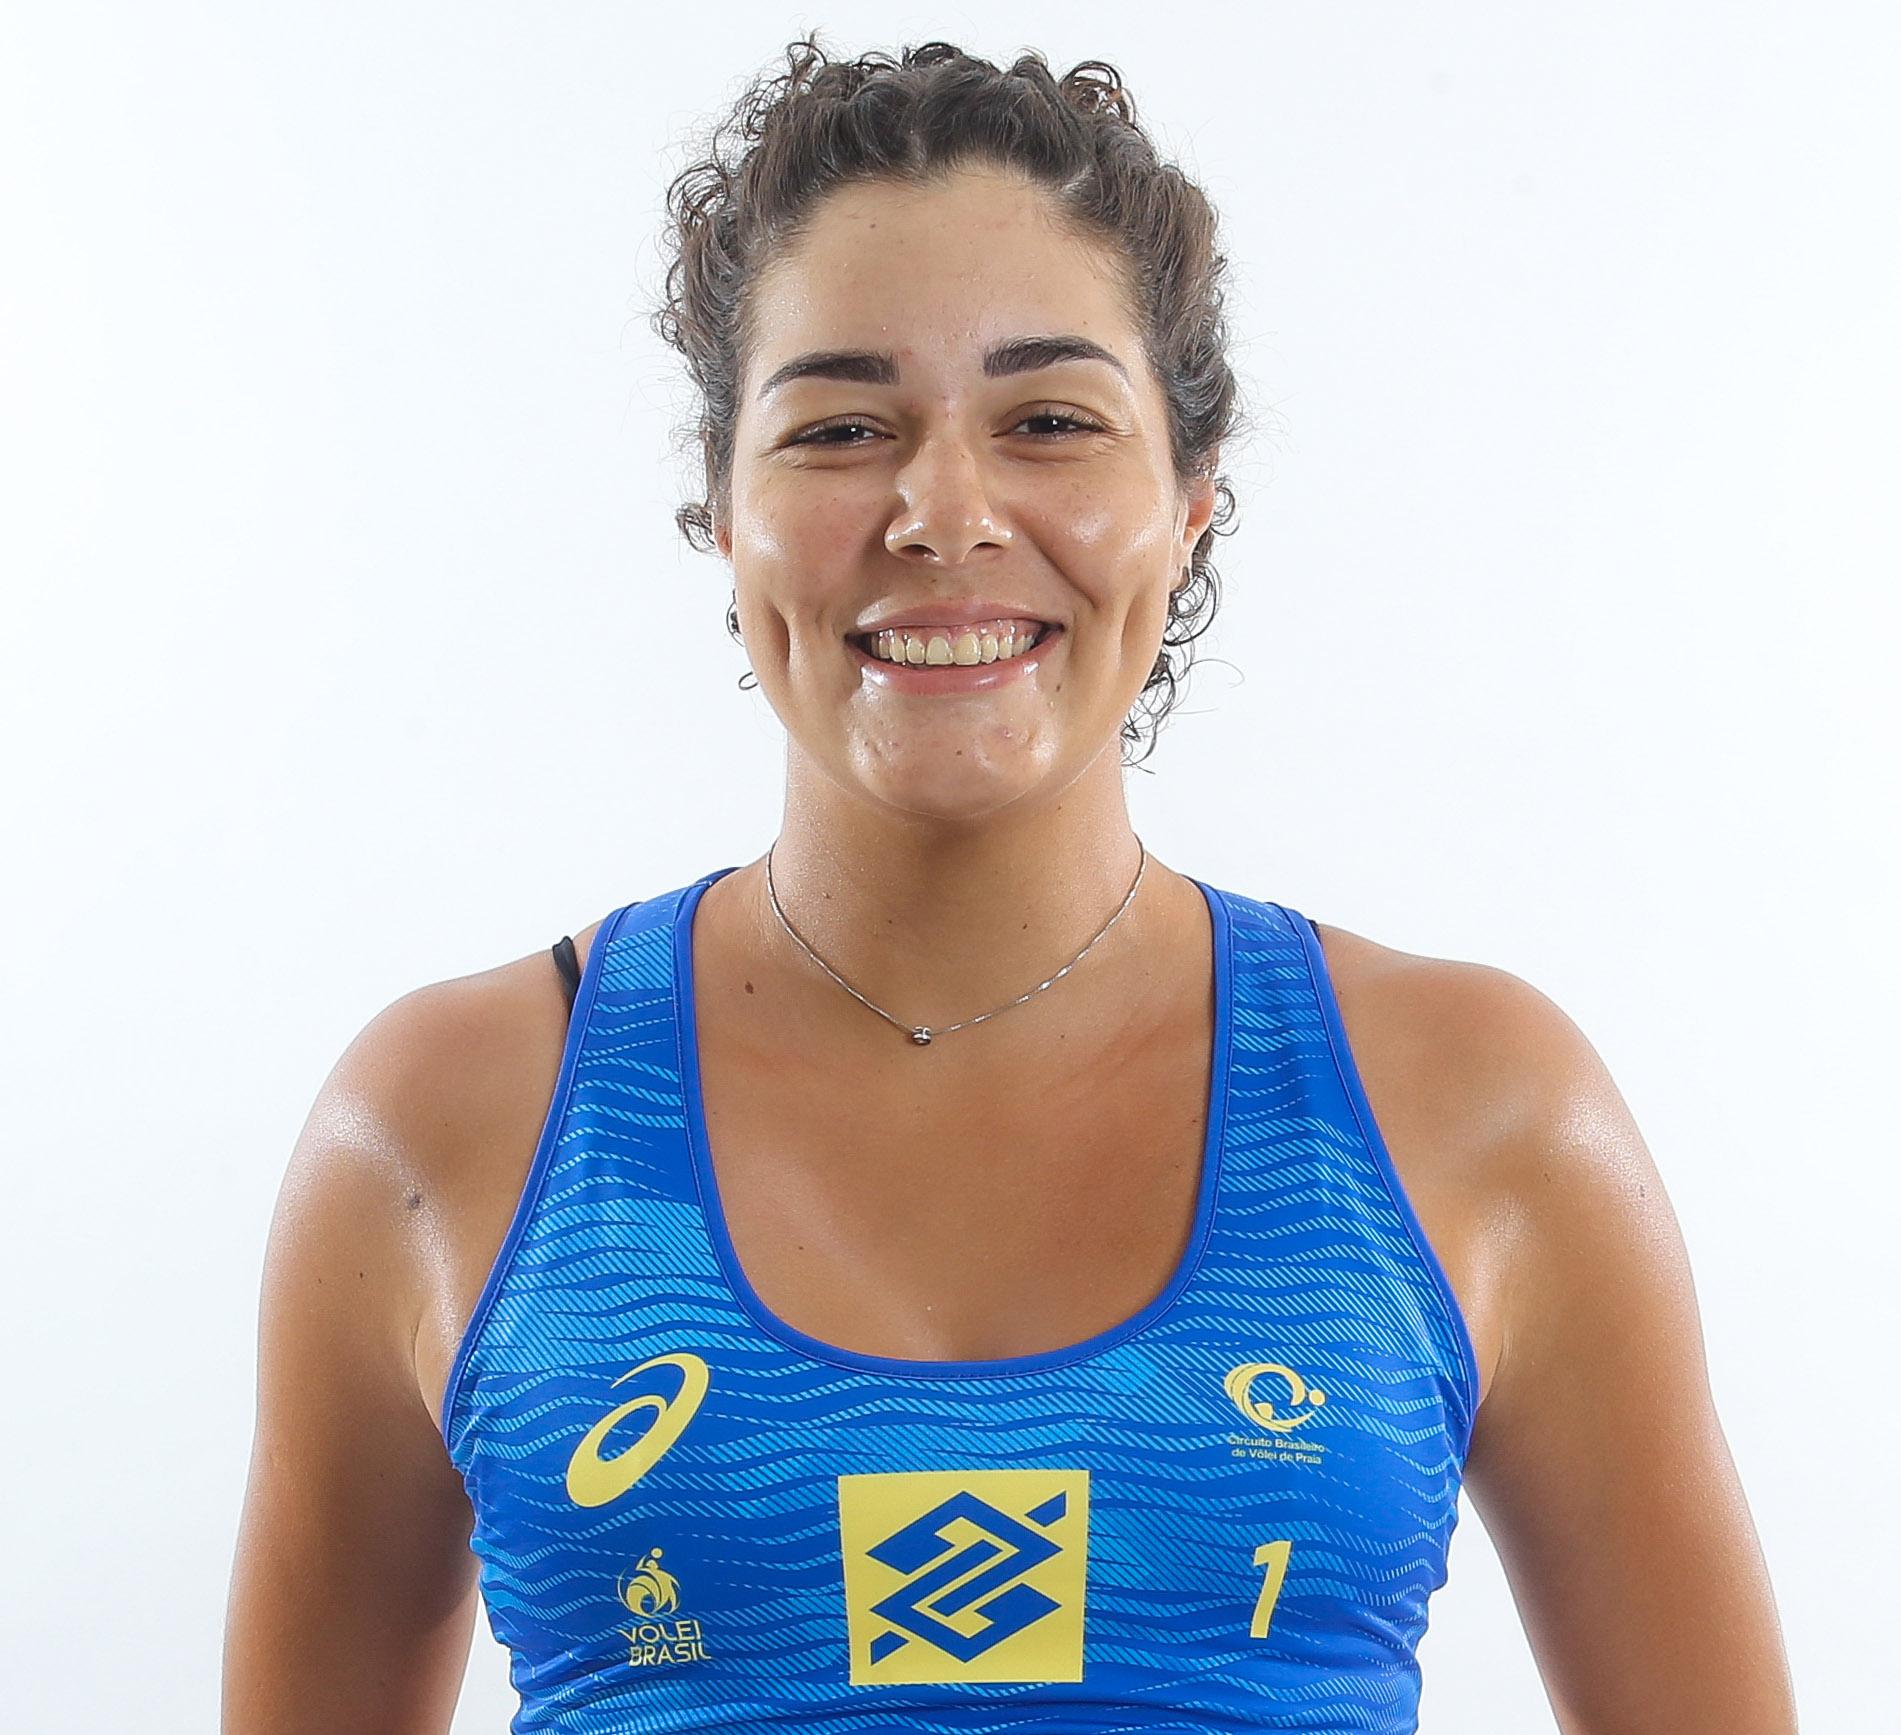 Ana Luiza Mohr Casé Stahnke